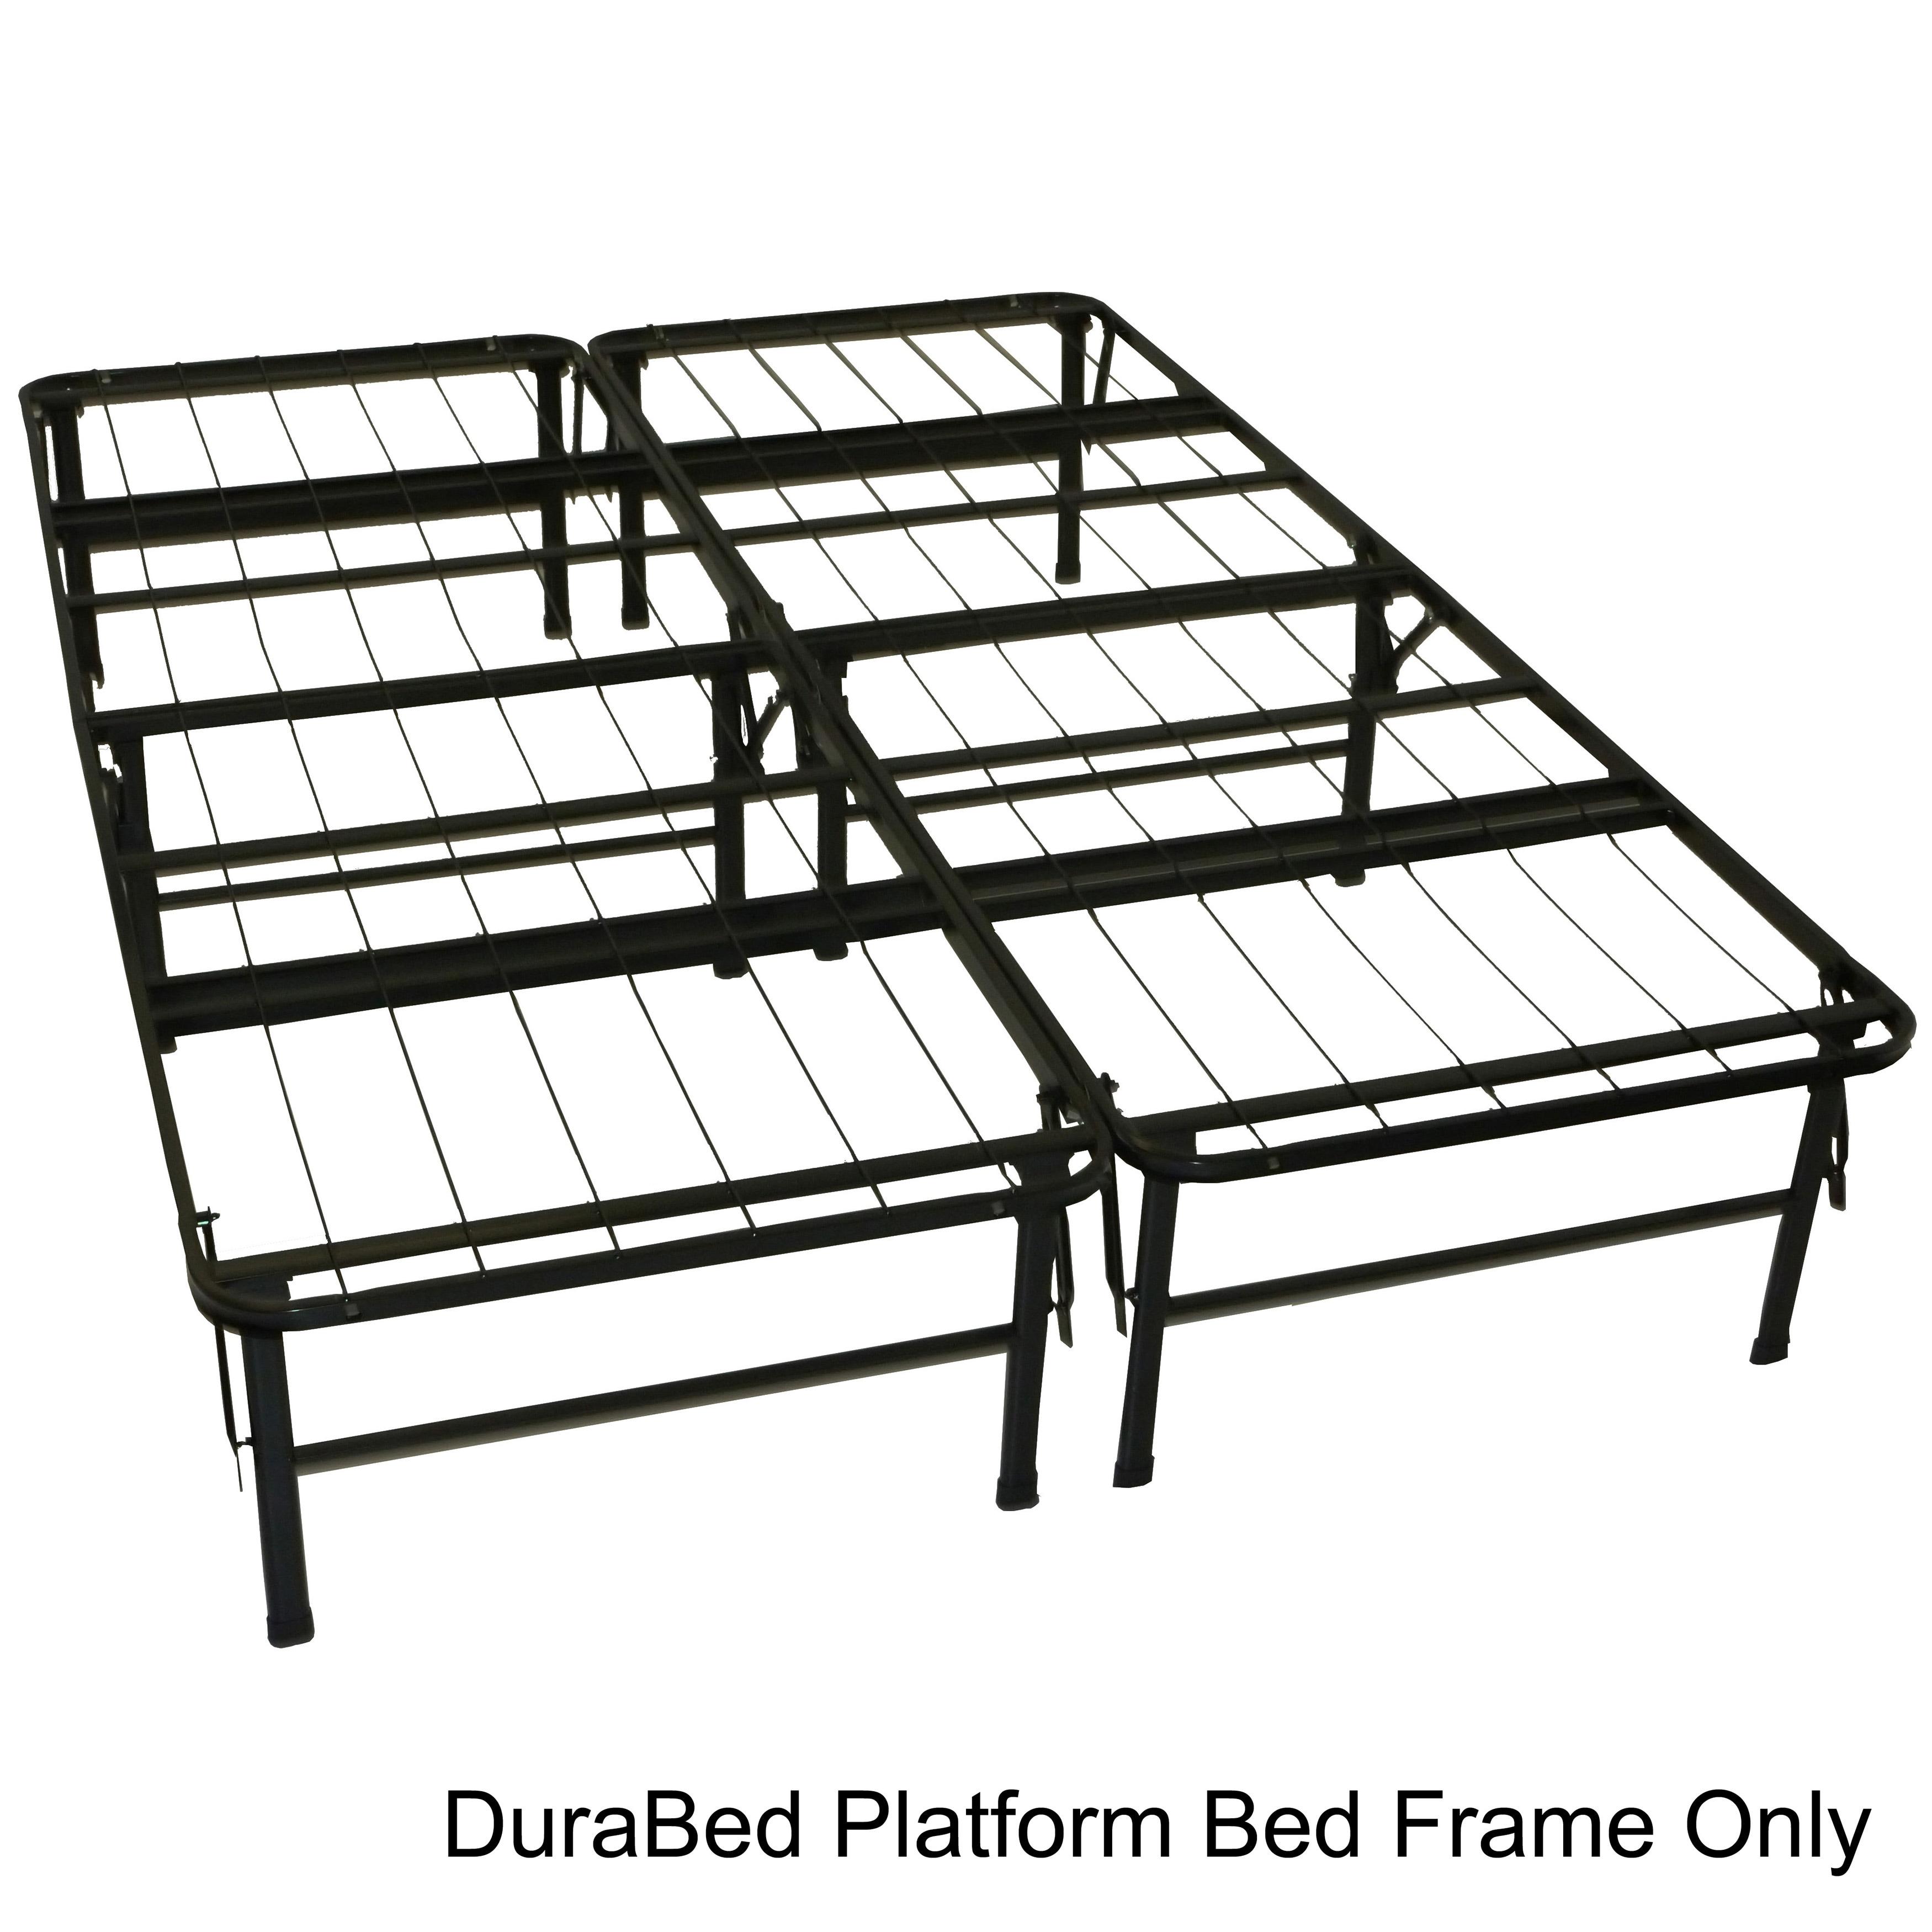 DuraBed Full size Heavy Duty Steel Foundation & Frame in